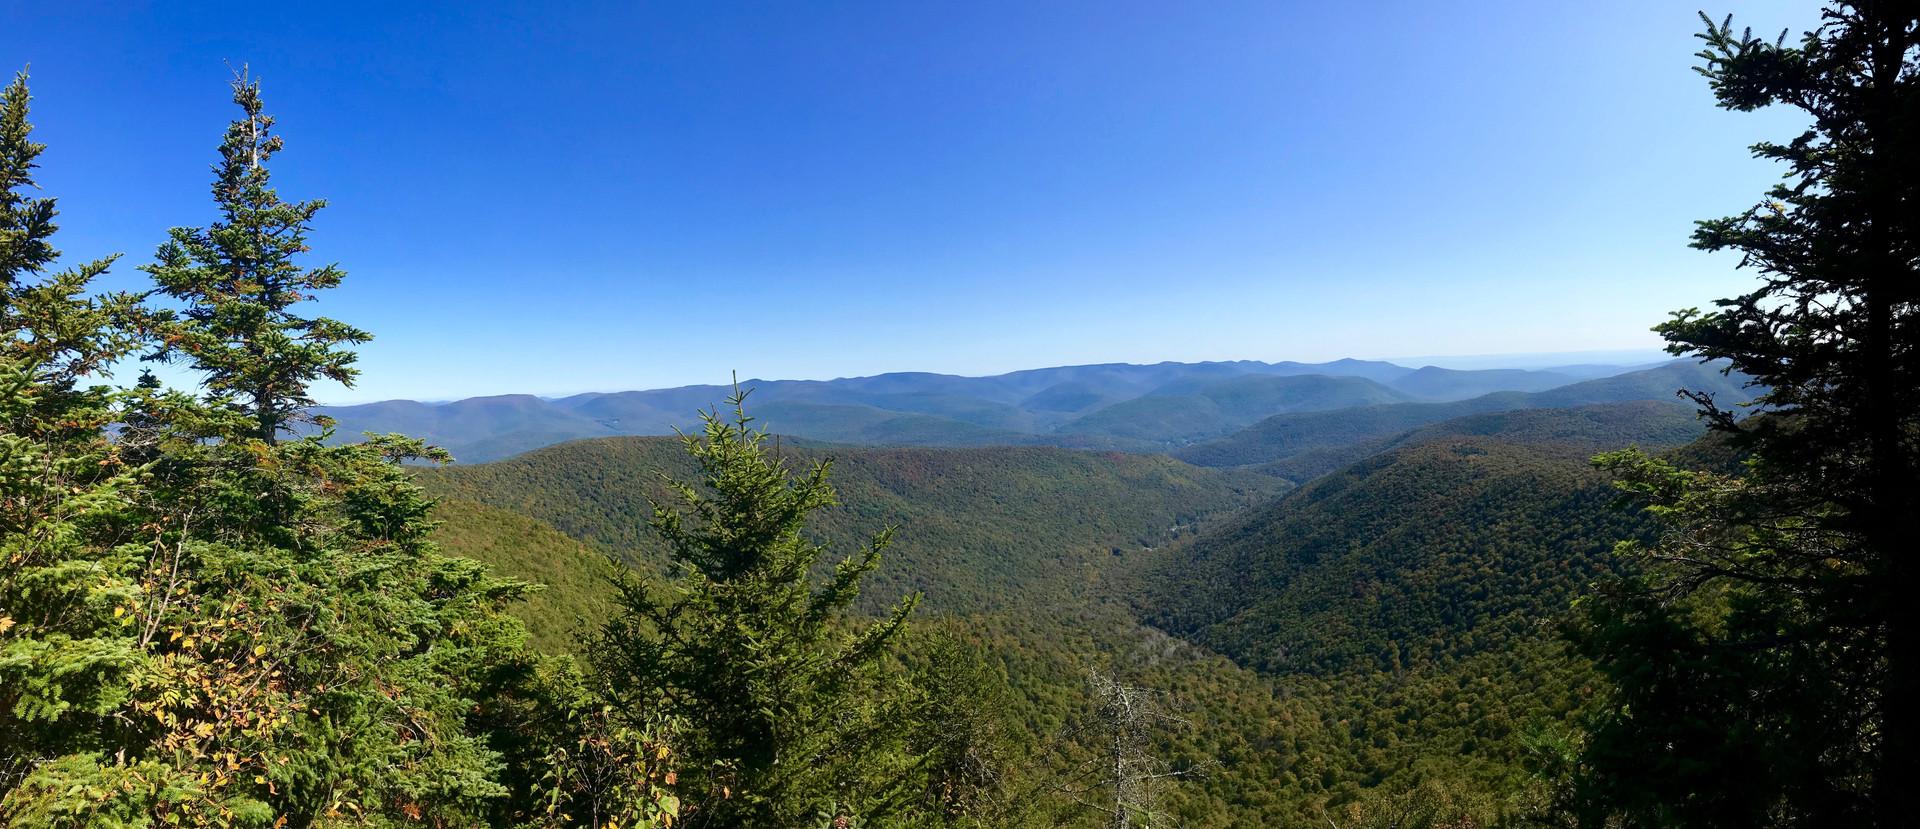 Panther Mountain, Catskill Mountains, NY